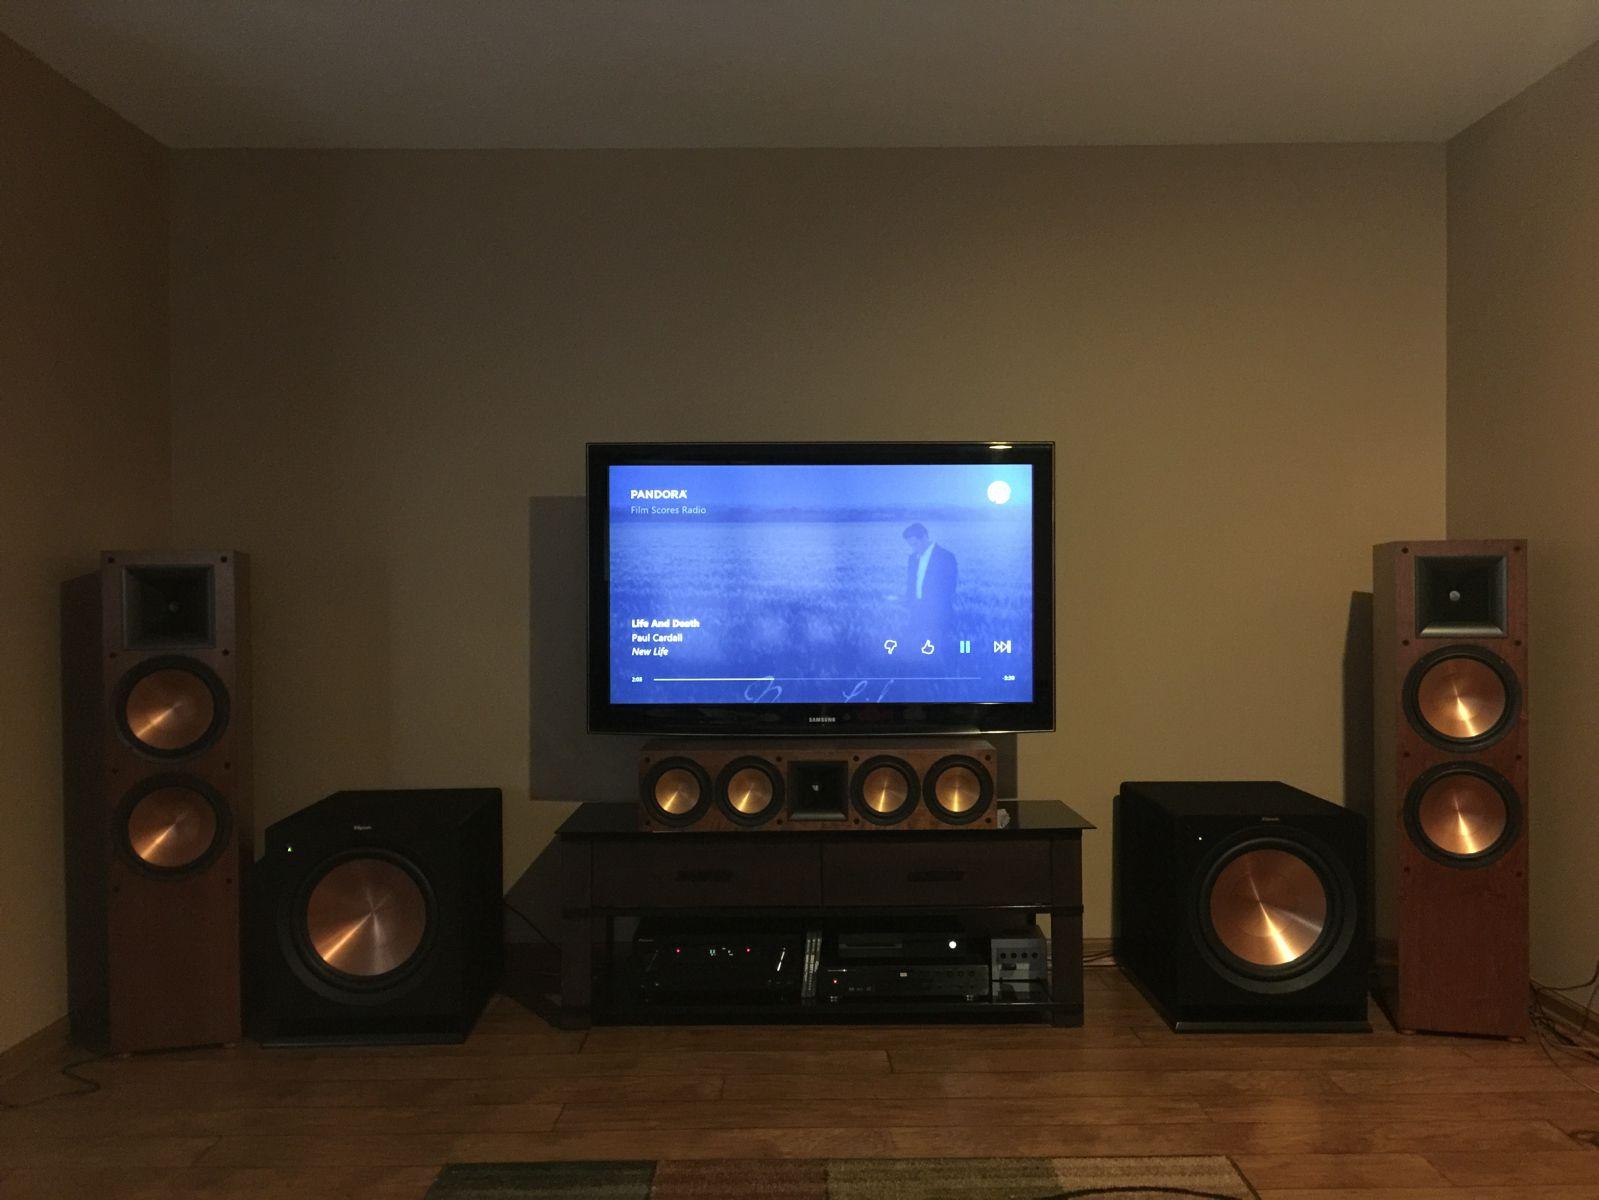 home theater showcase the klipsch audio community. Black Bedroom Furniture Sets. Home Design Ideas